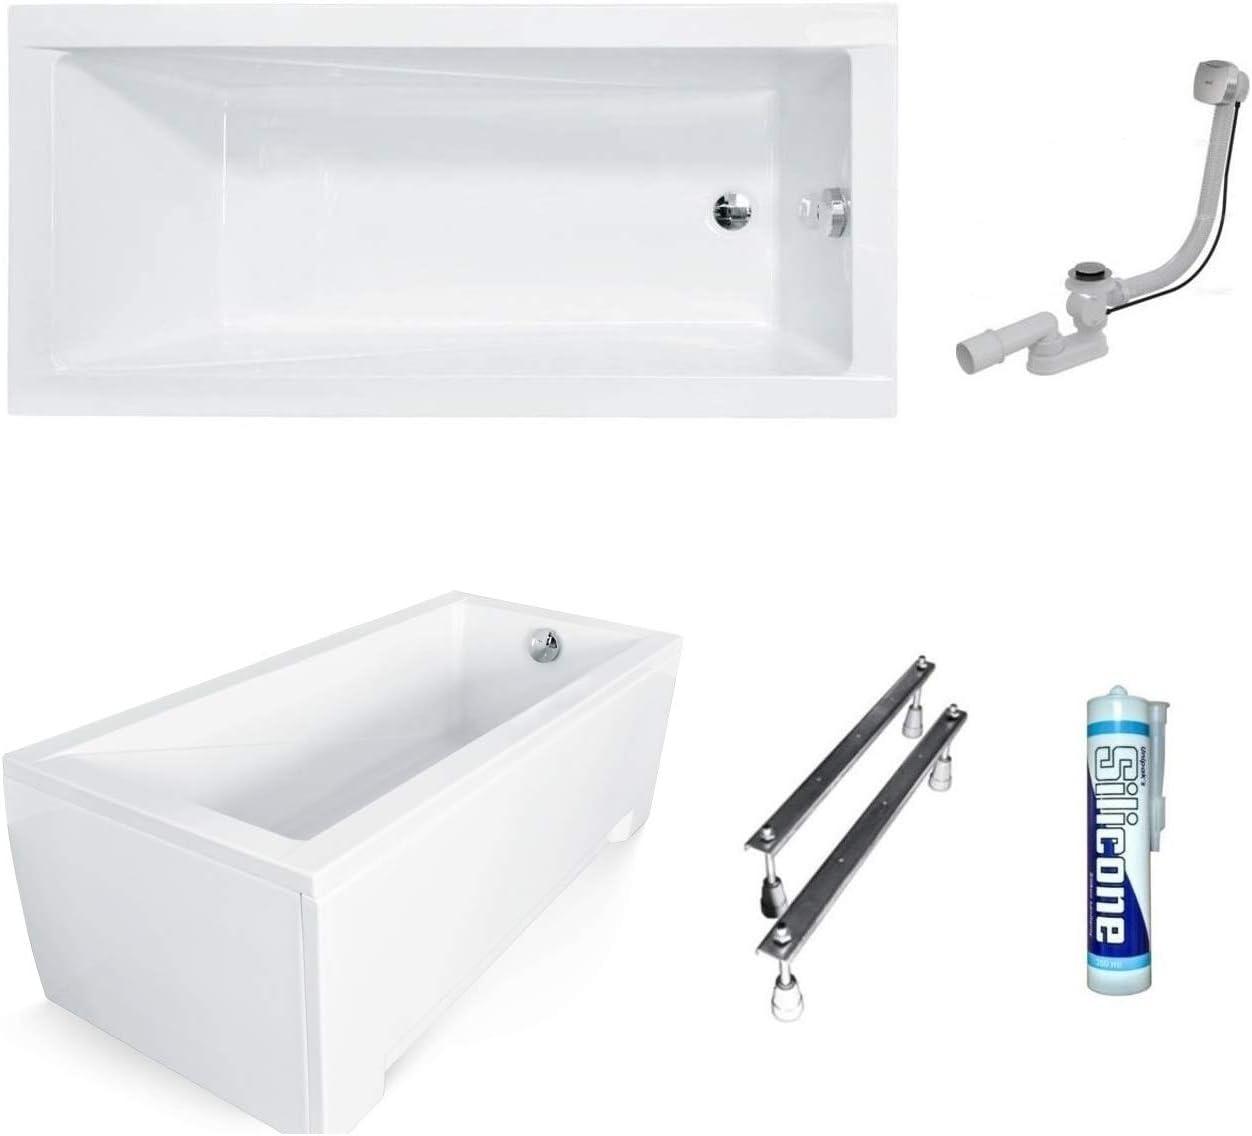 Badewanne Rechteck Modern Acryl 170x70 Schürze Ablaufgarnitur Füße SilikonGRATIS